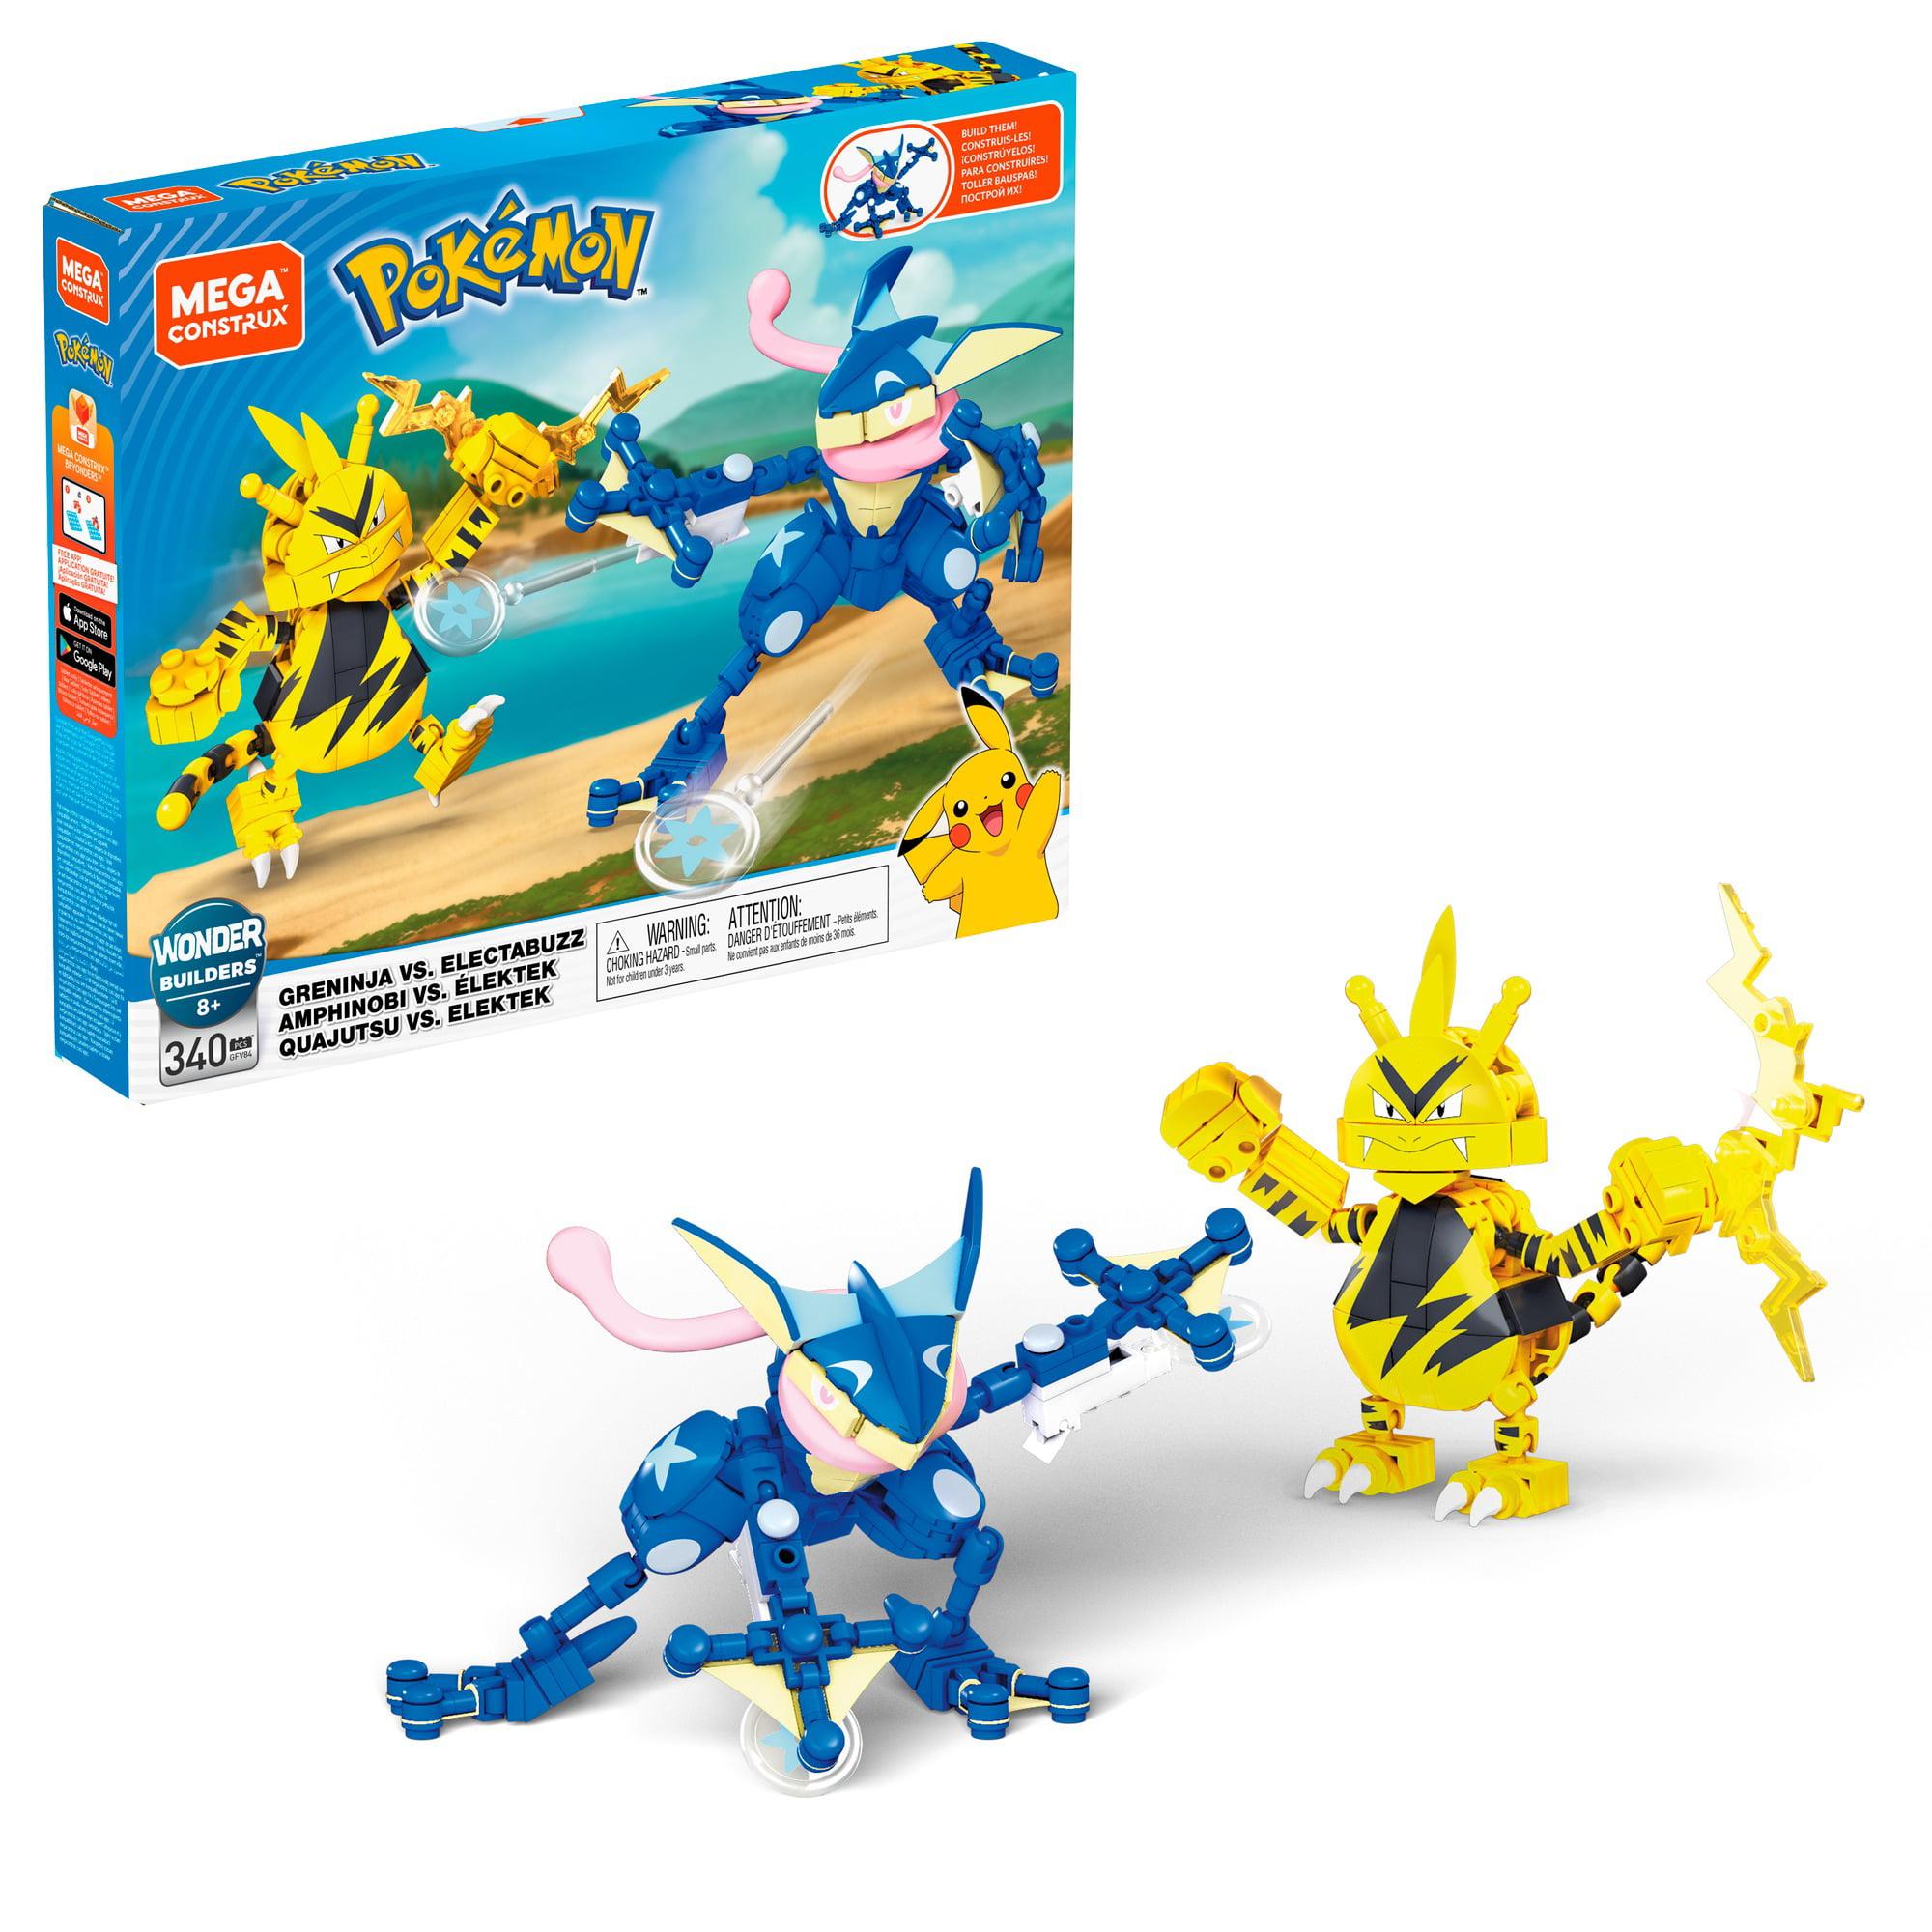 Mega Construx Pokemon Greninja Vs Electabuzz Construction Set With Character Figures Building Toys For Kids 340 Pieces Walmart Com Walmart Com